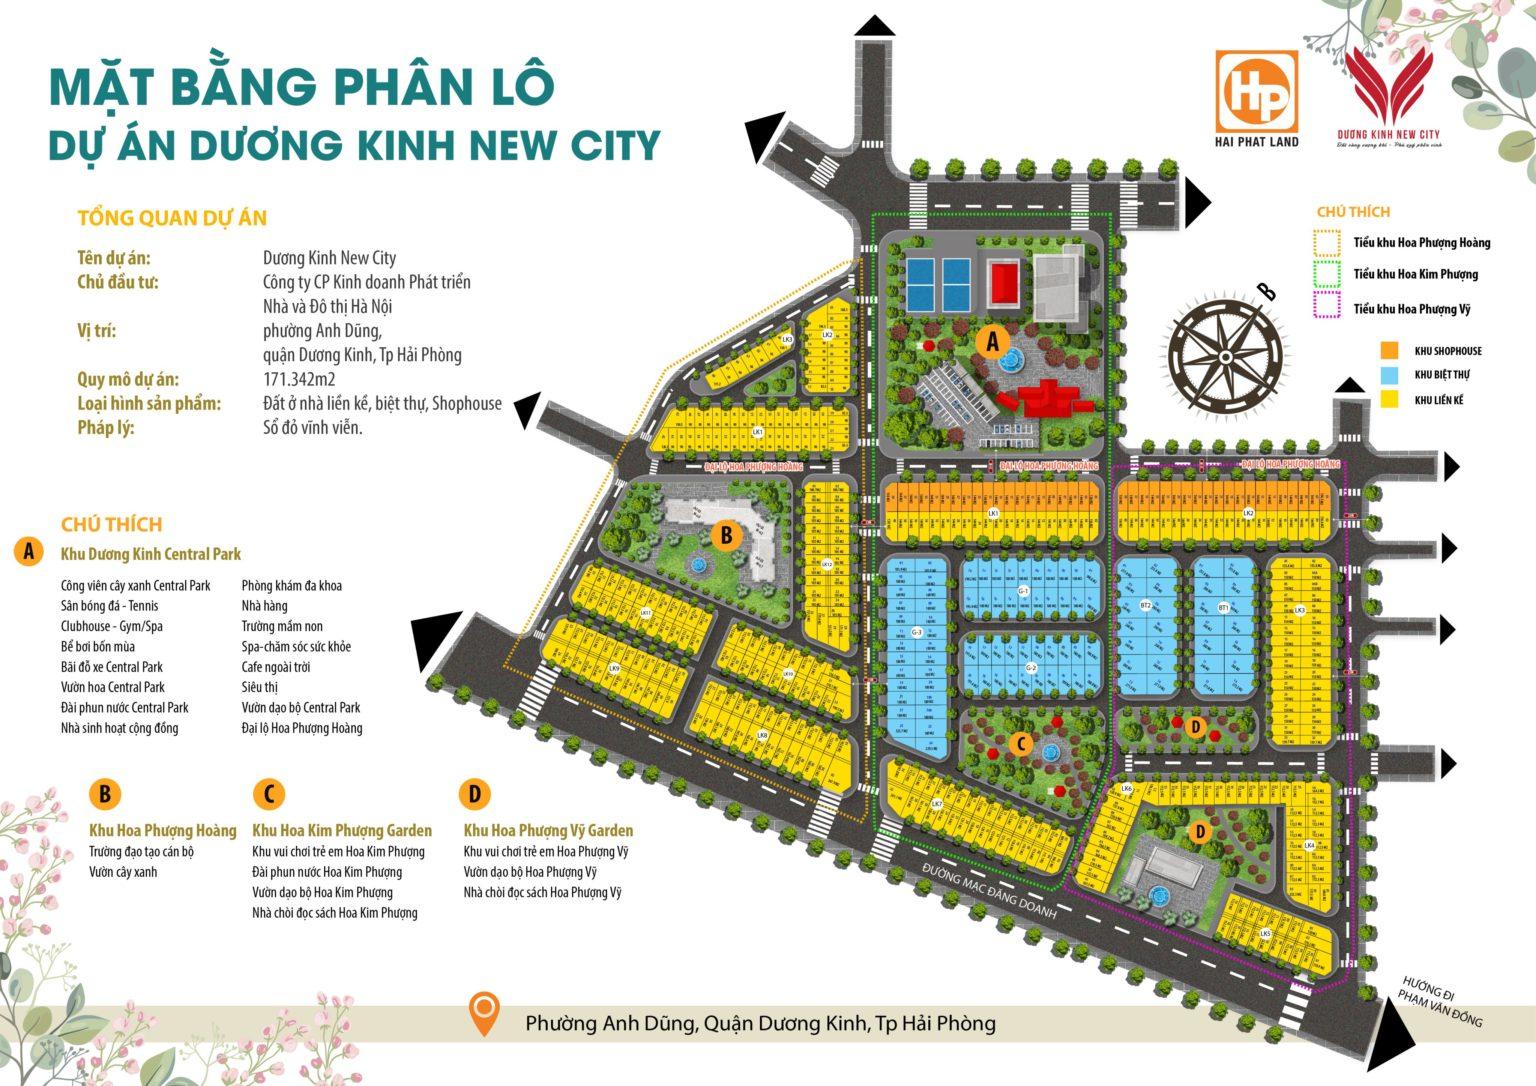 duong-kinh-new-city-5